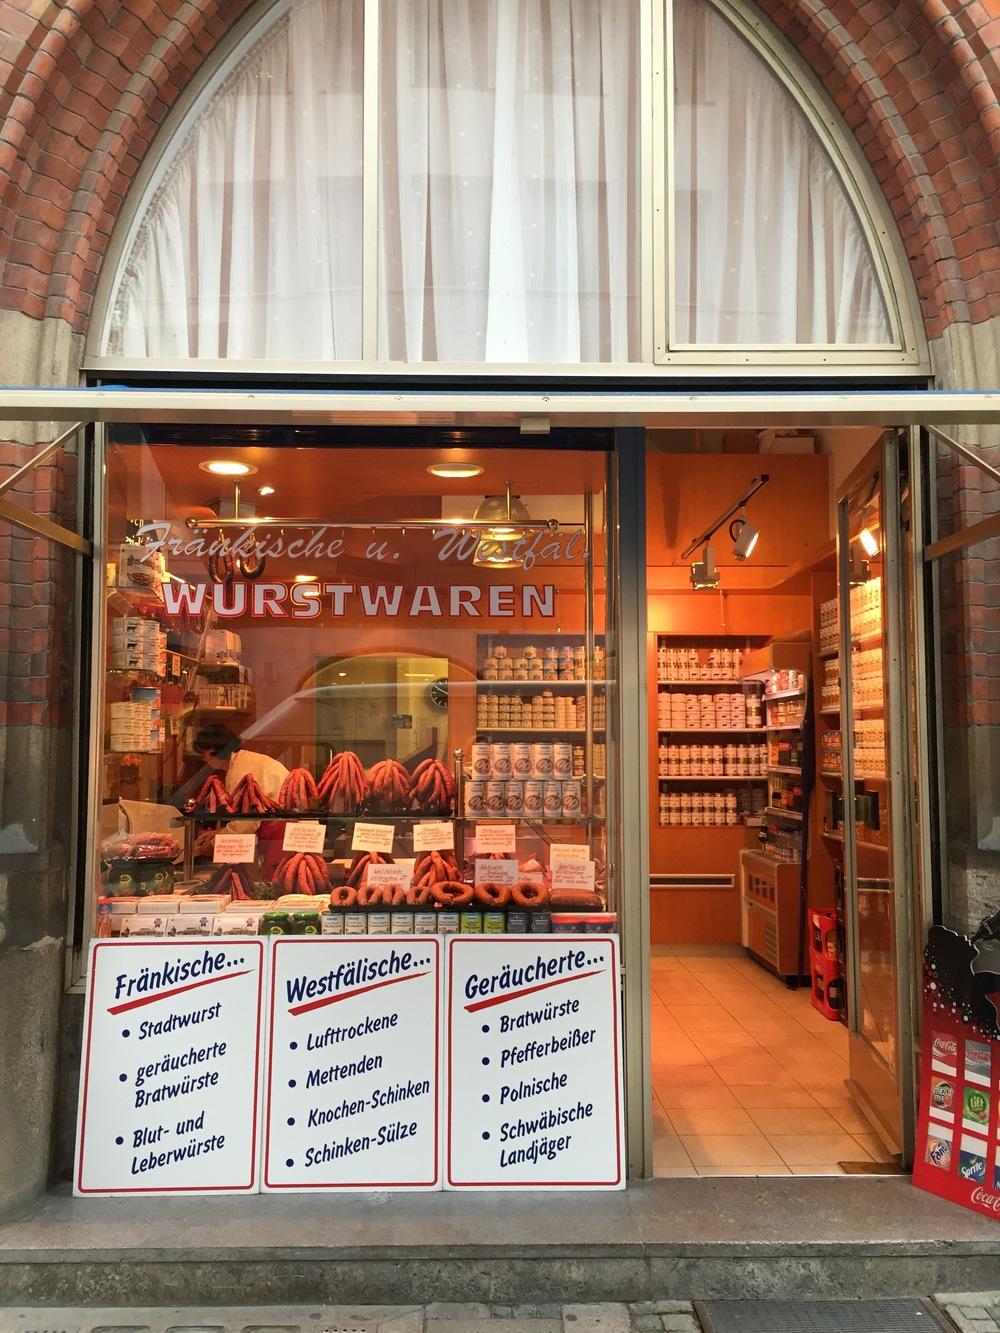 They love a sausage. Munich.